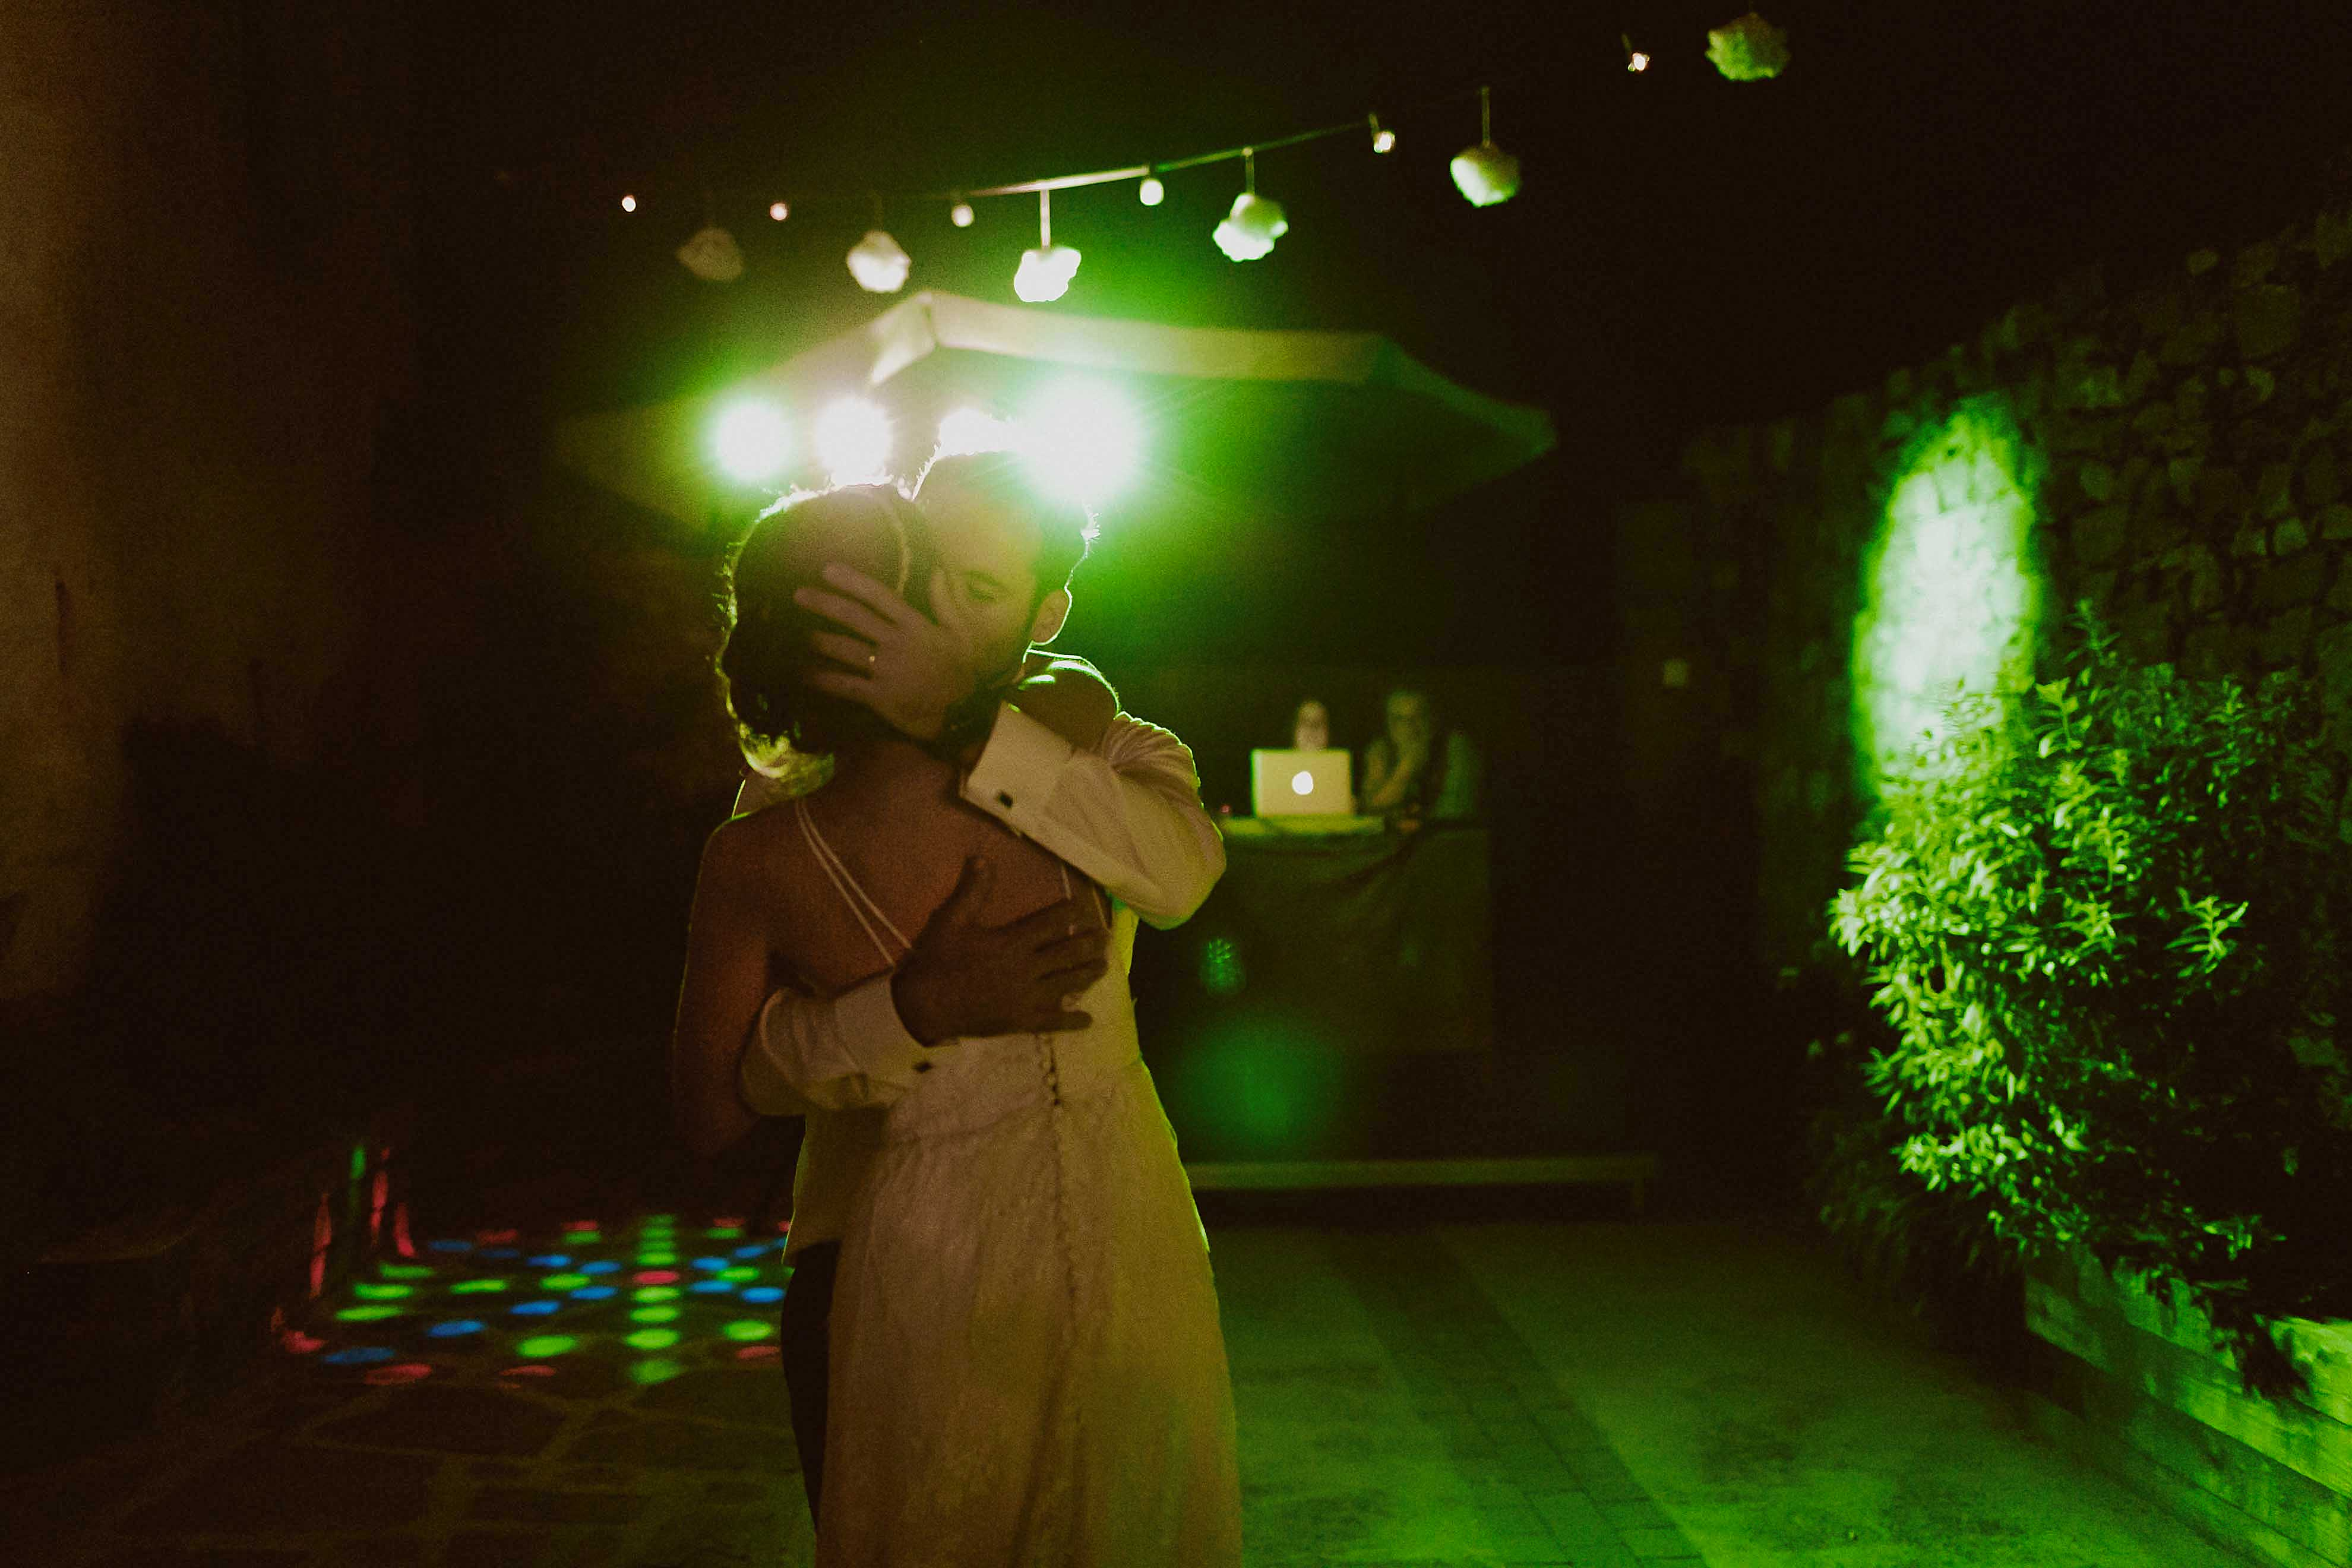 Boda rústica en la montaña. fotgrafo de bodas barcelona_113